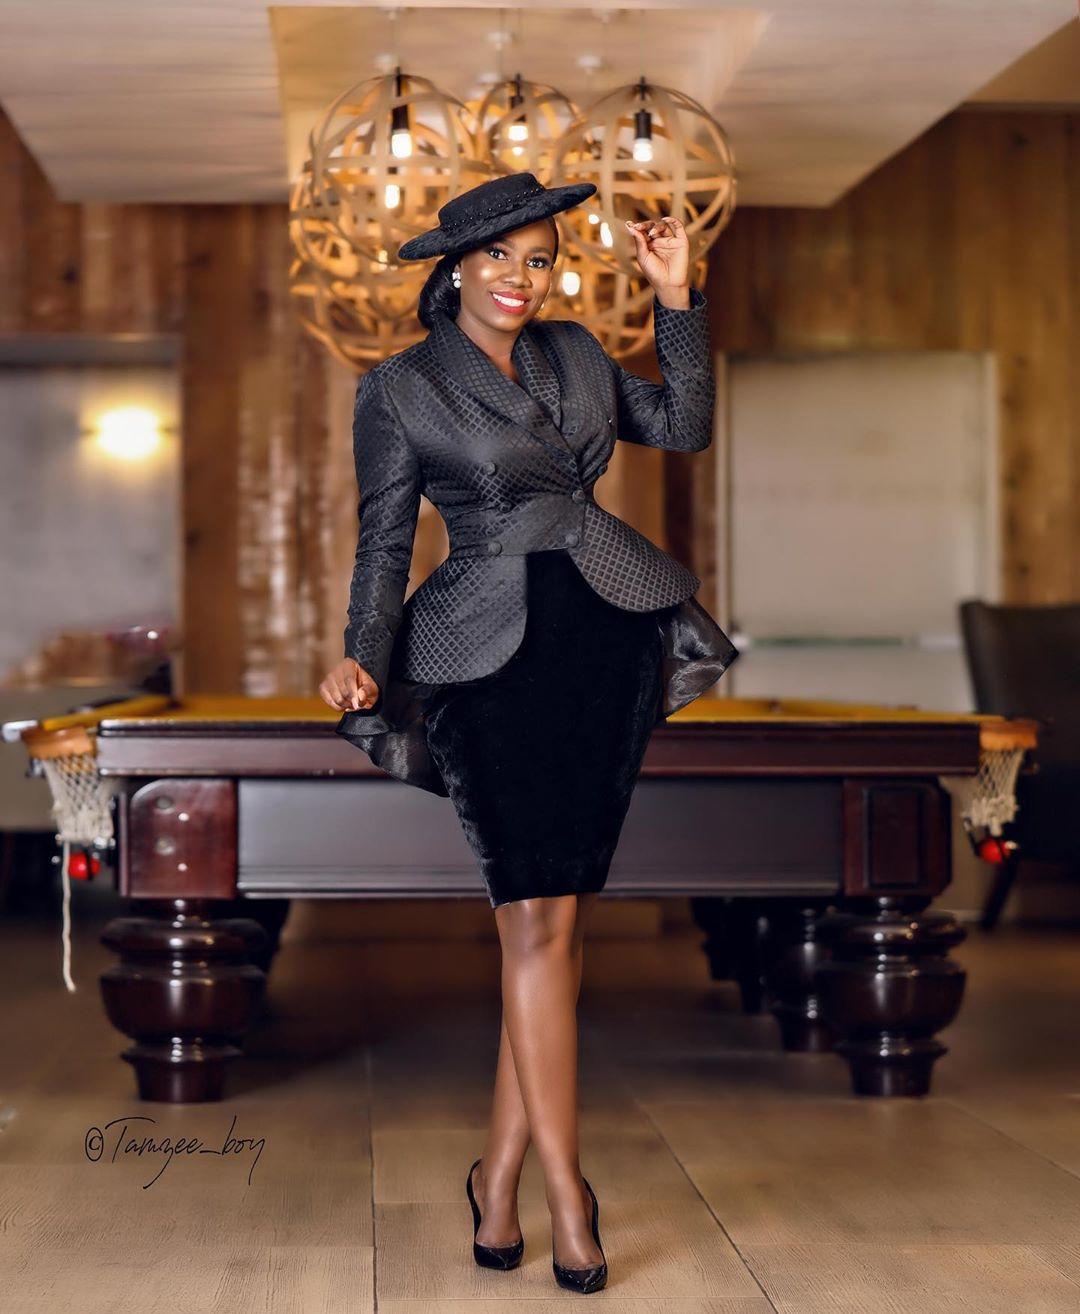 celebrity-stylist-mimi-yina-medlin-boss-celebrates-birthday-in-style